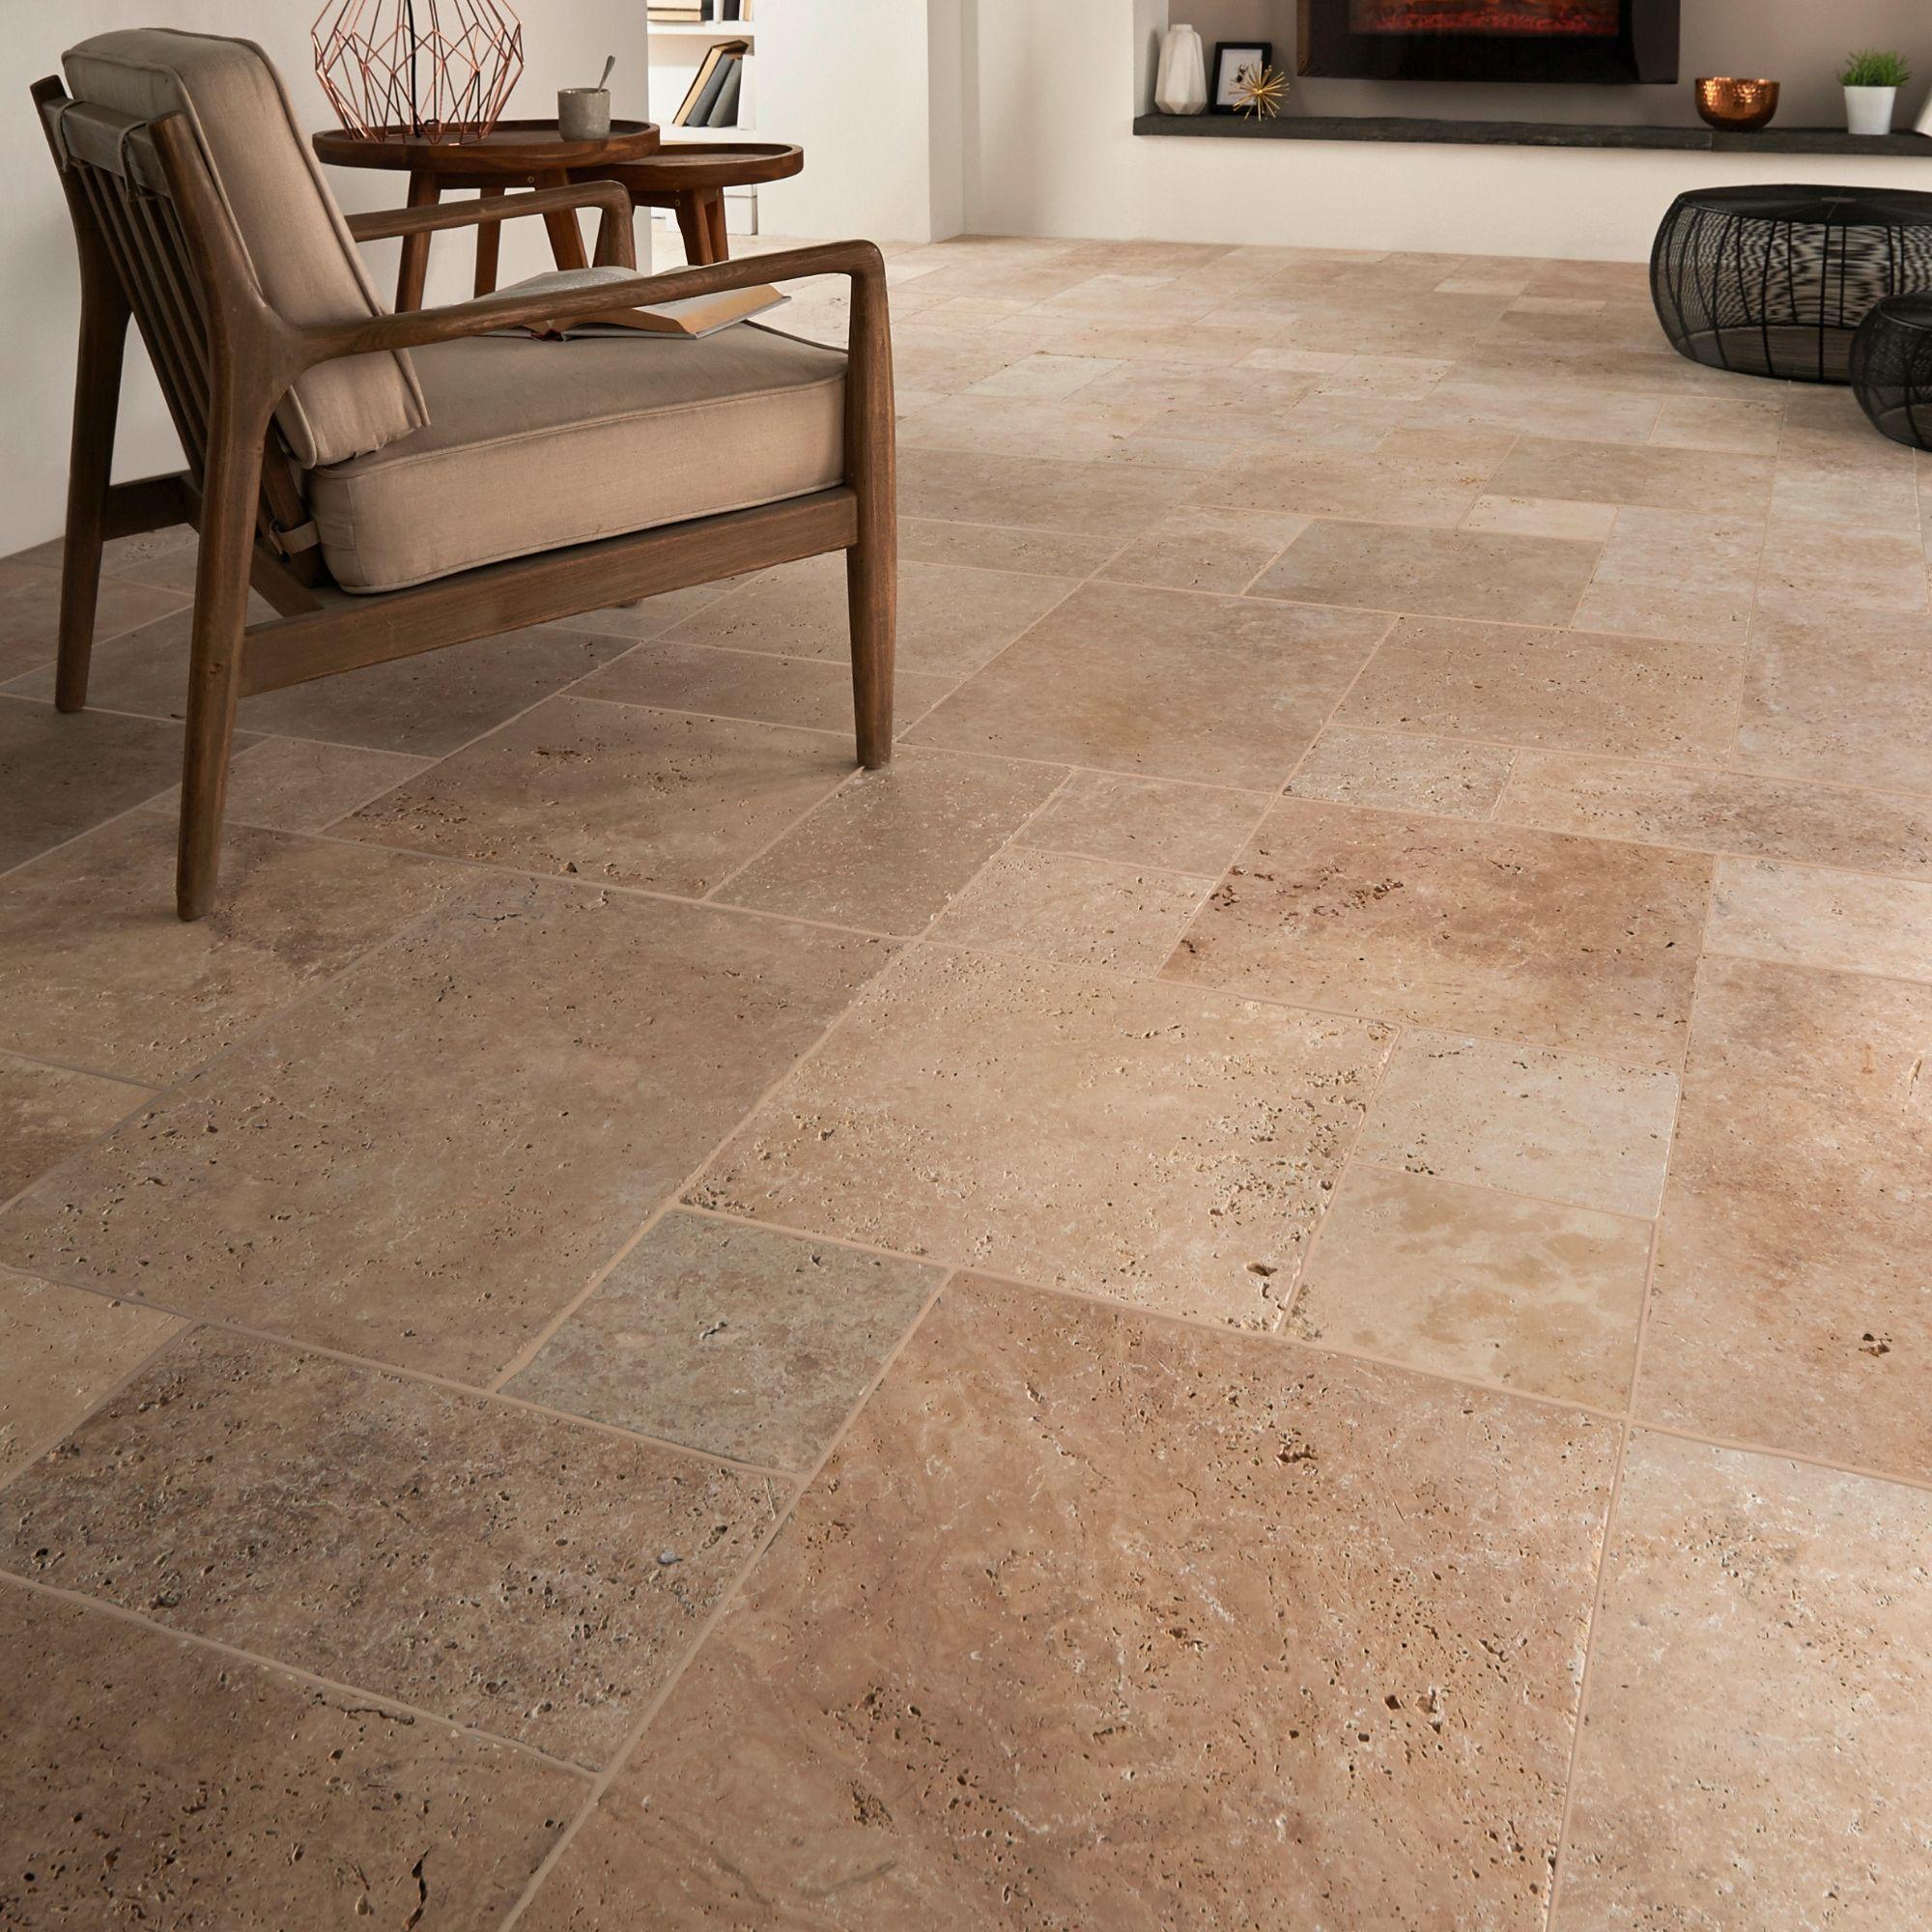 Tumbled Travertine Cream Matt Stone Effect Natural Stone Floor Tile Pack Of 6 L 610mm W 406mm Departments Diy At B Q